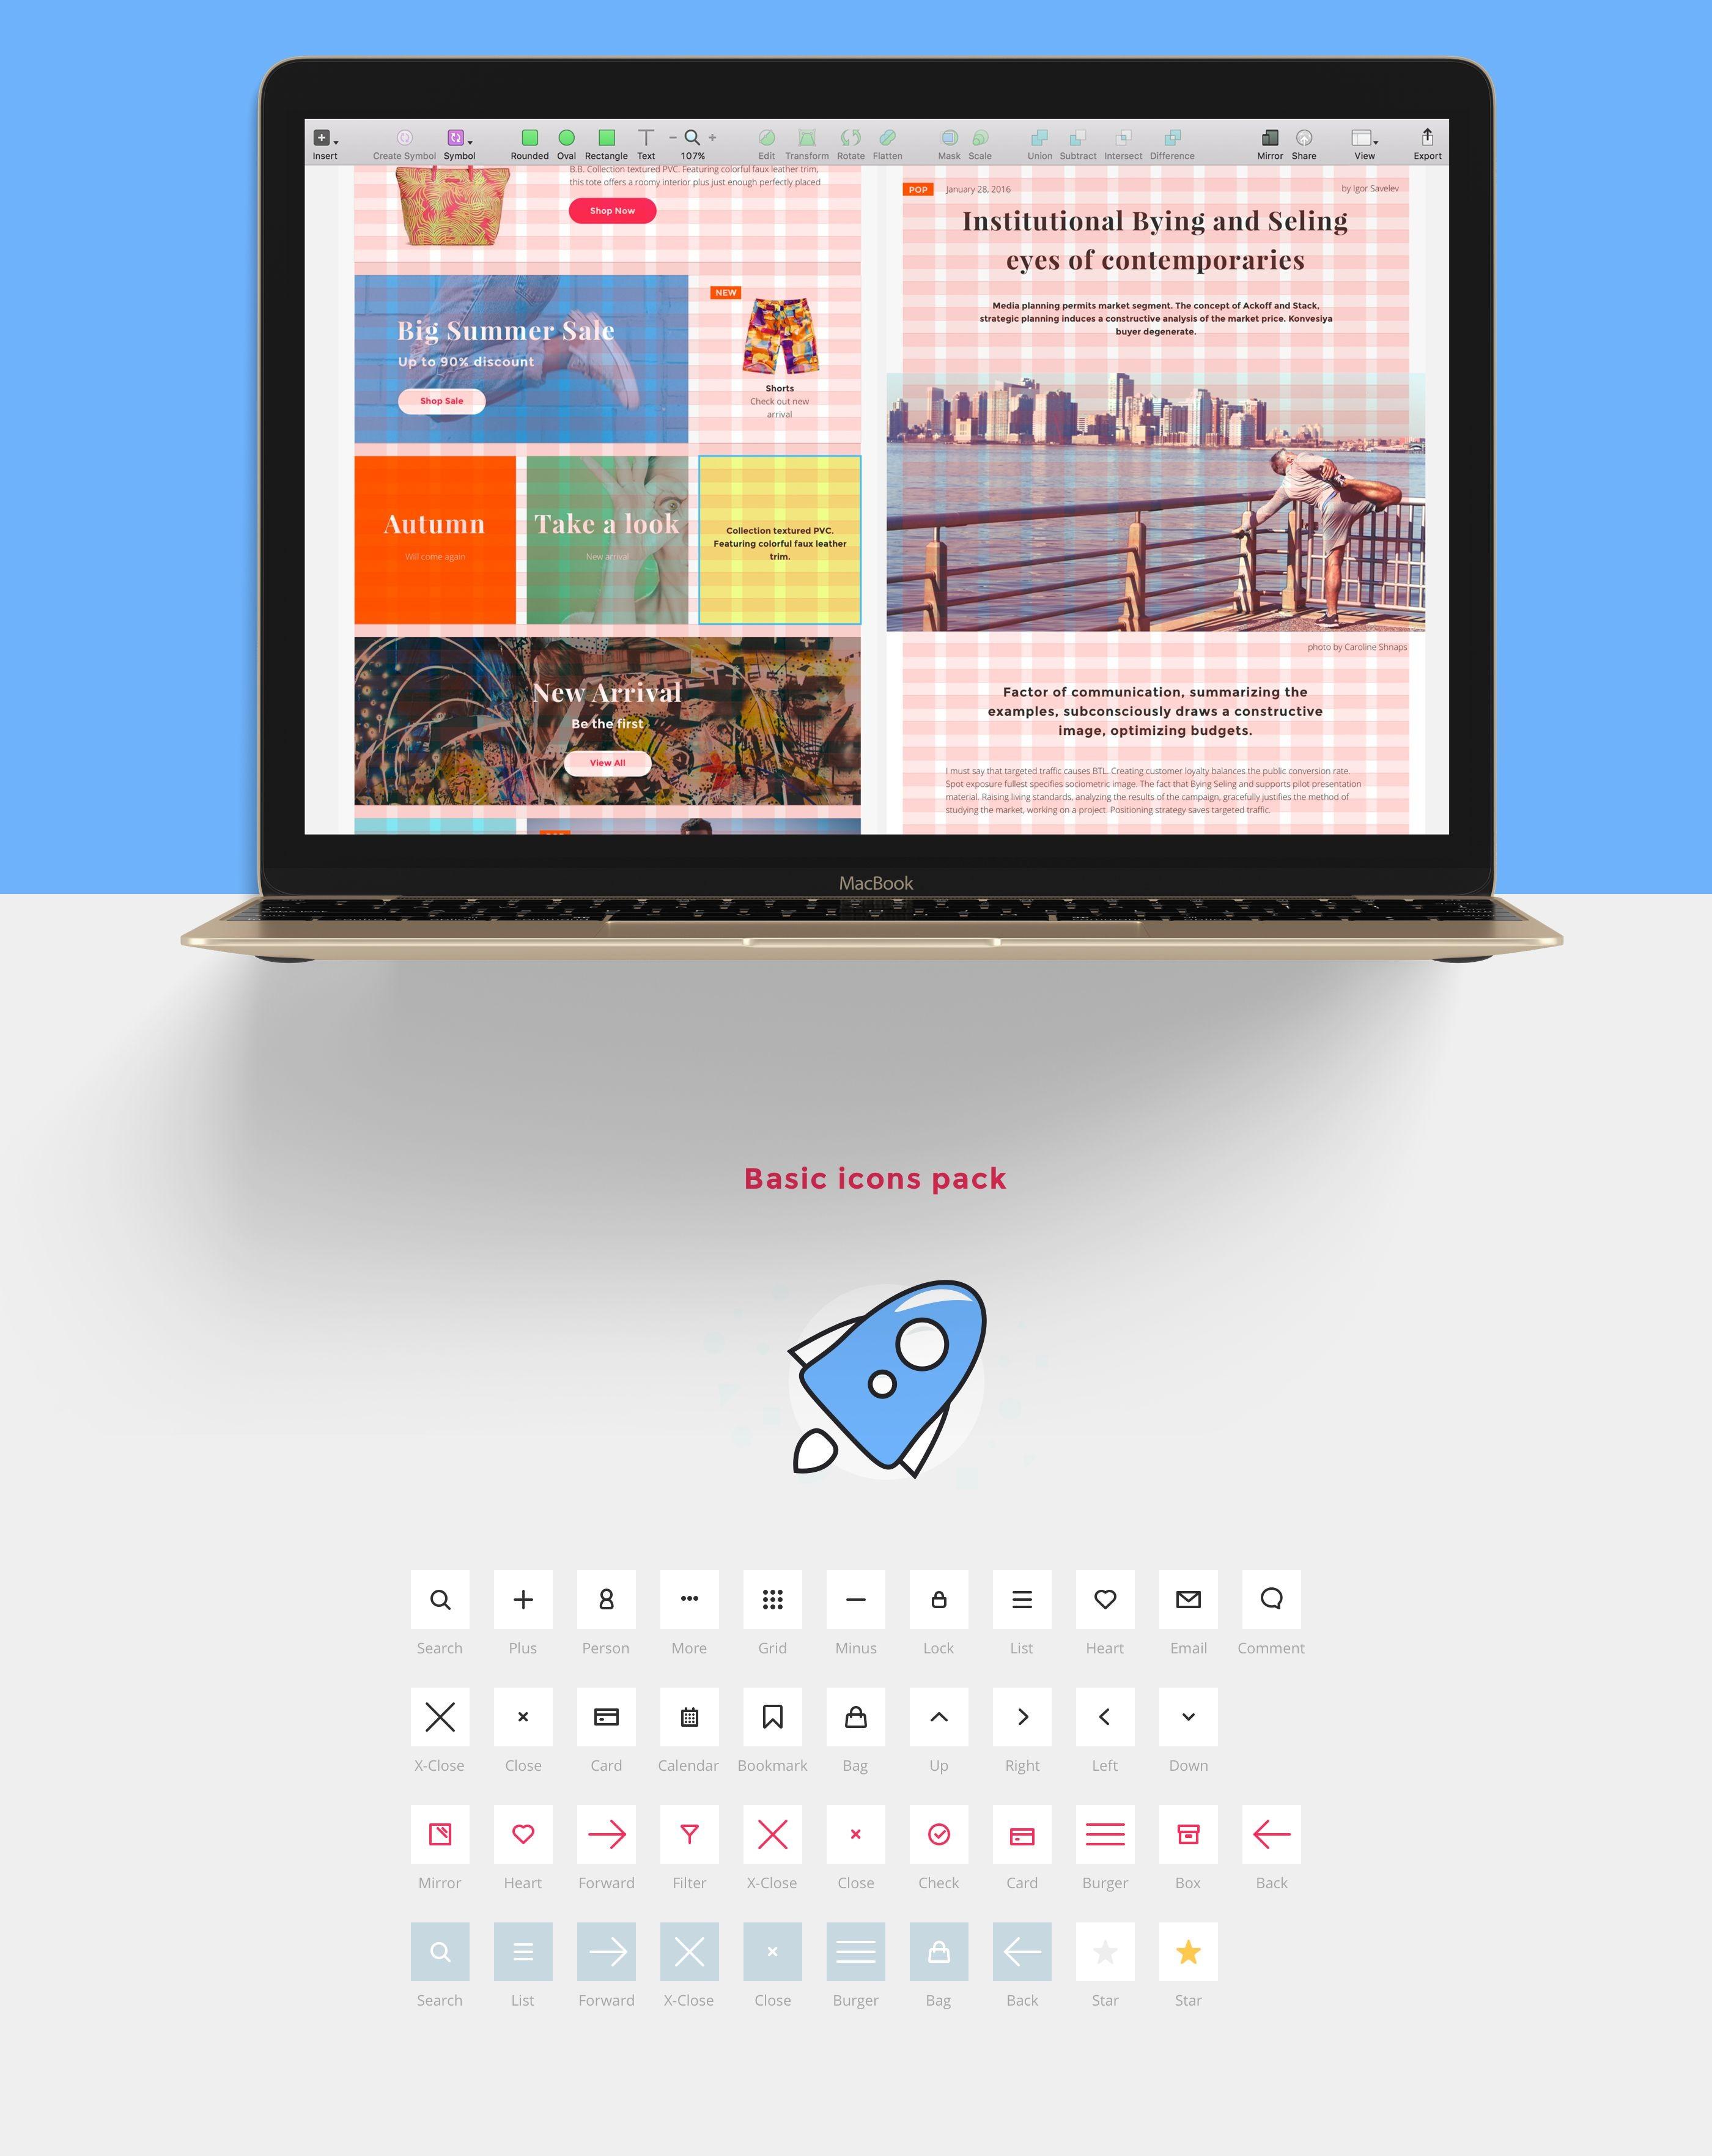 UI Design Paket für Online Shops -Raster System